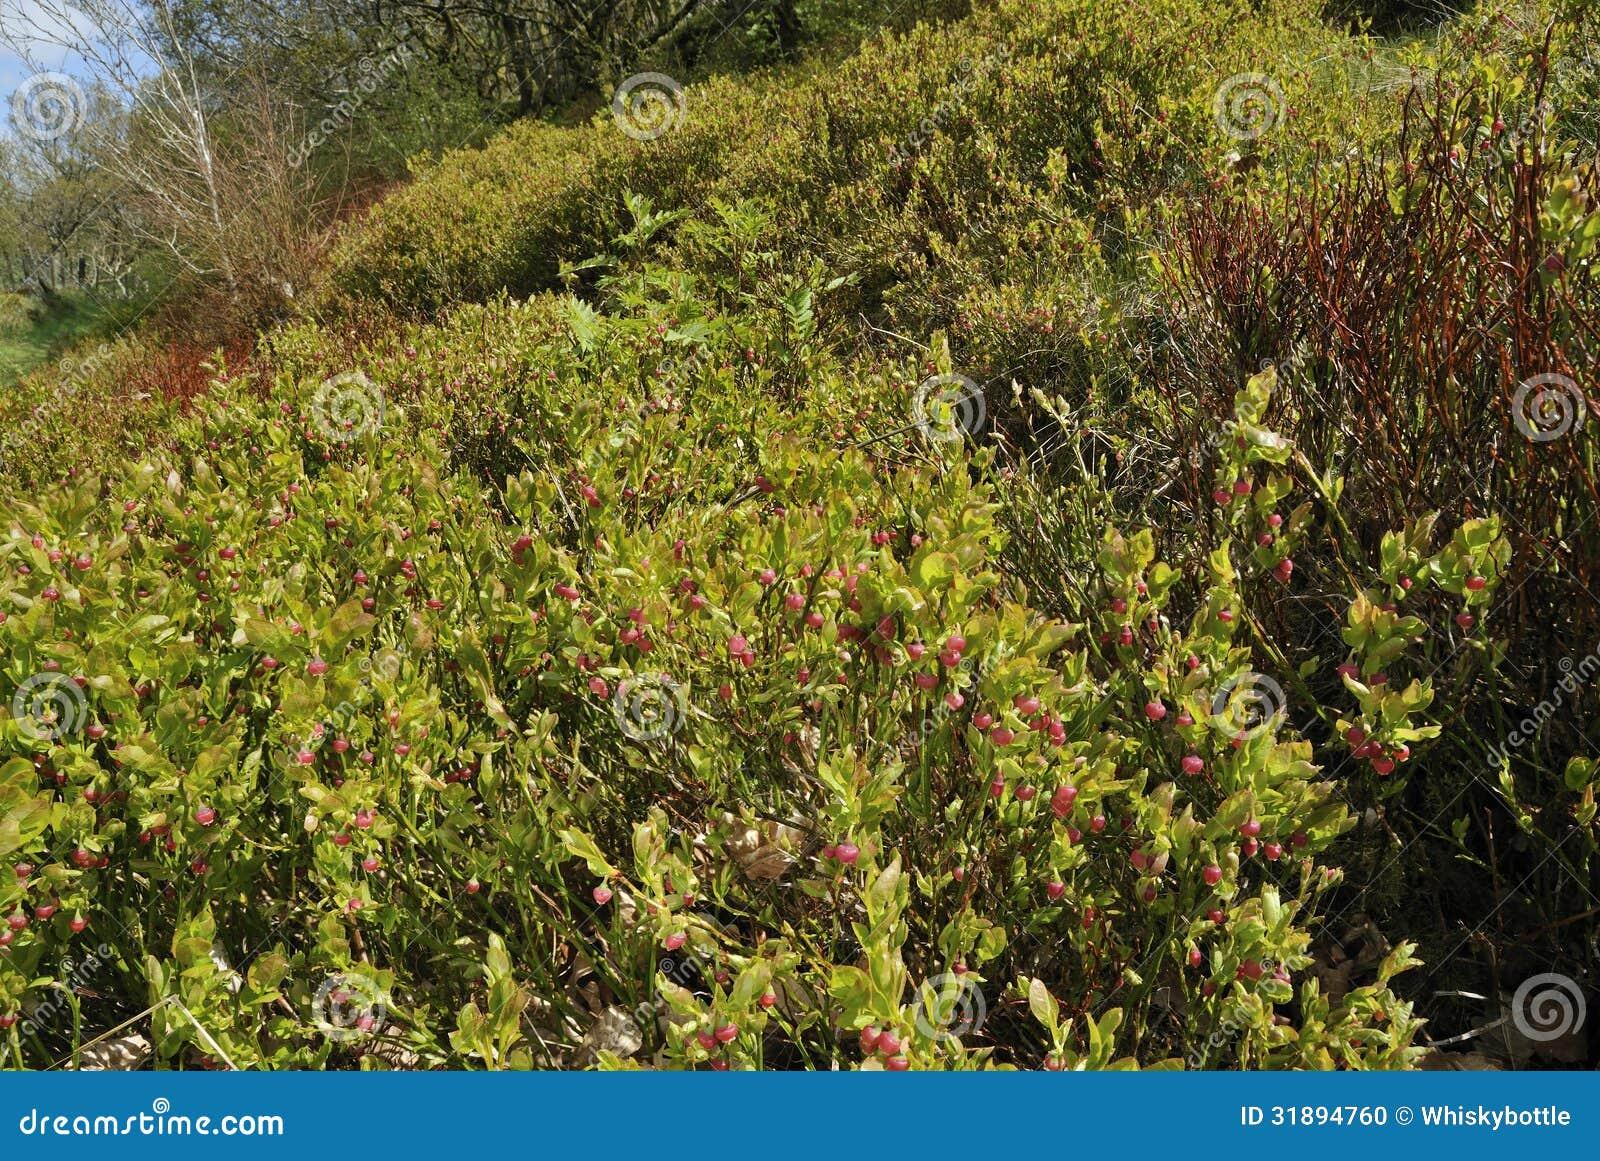 Bilberry scrub stock photo image 31894760 for Large flowering shrubs